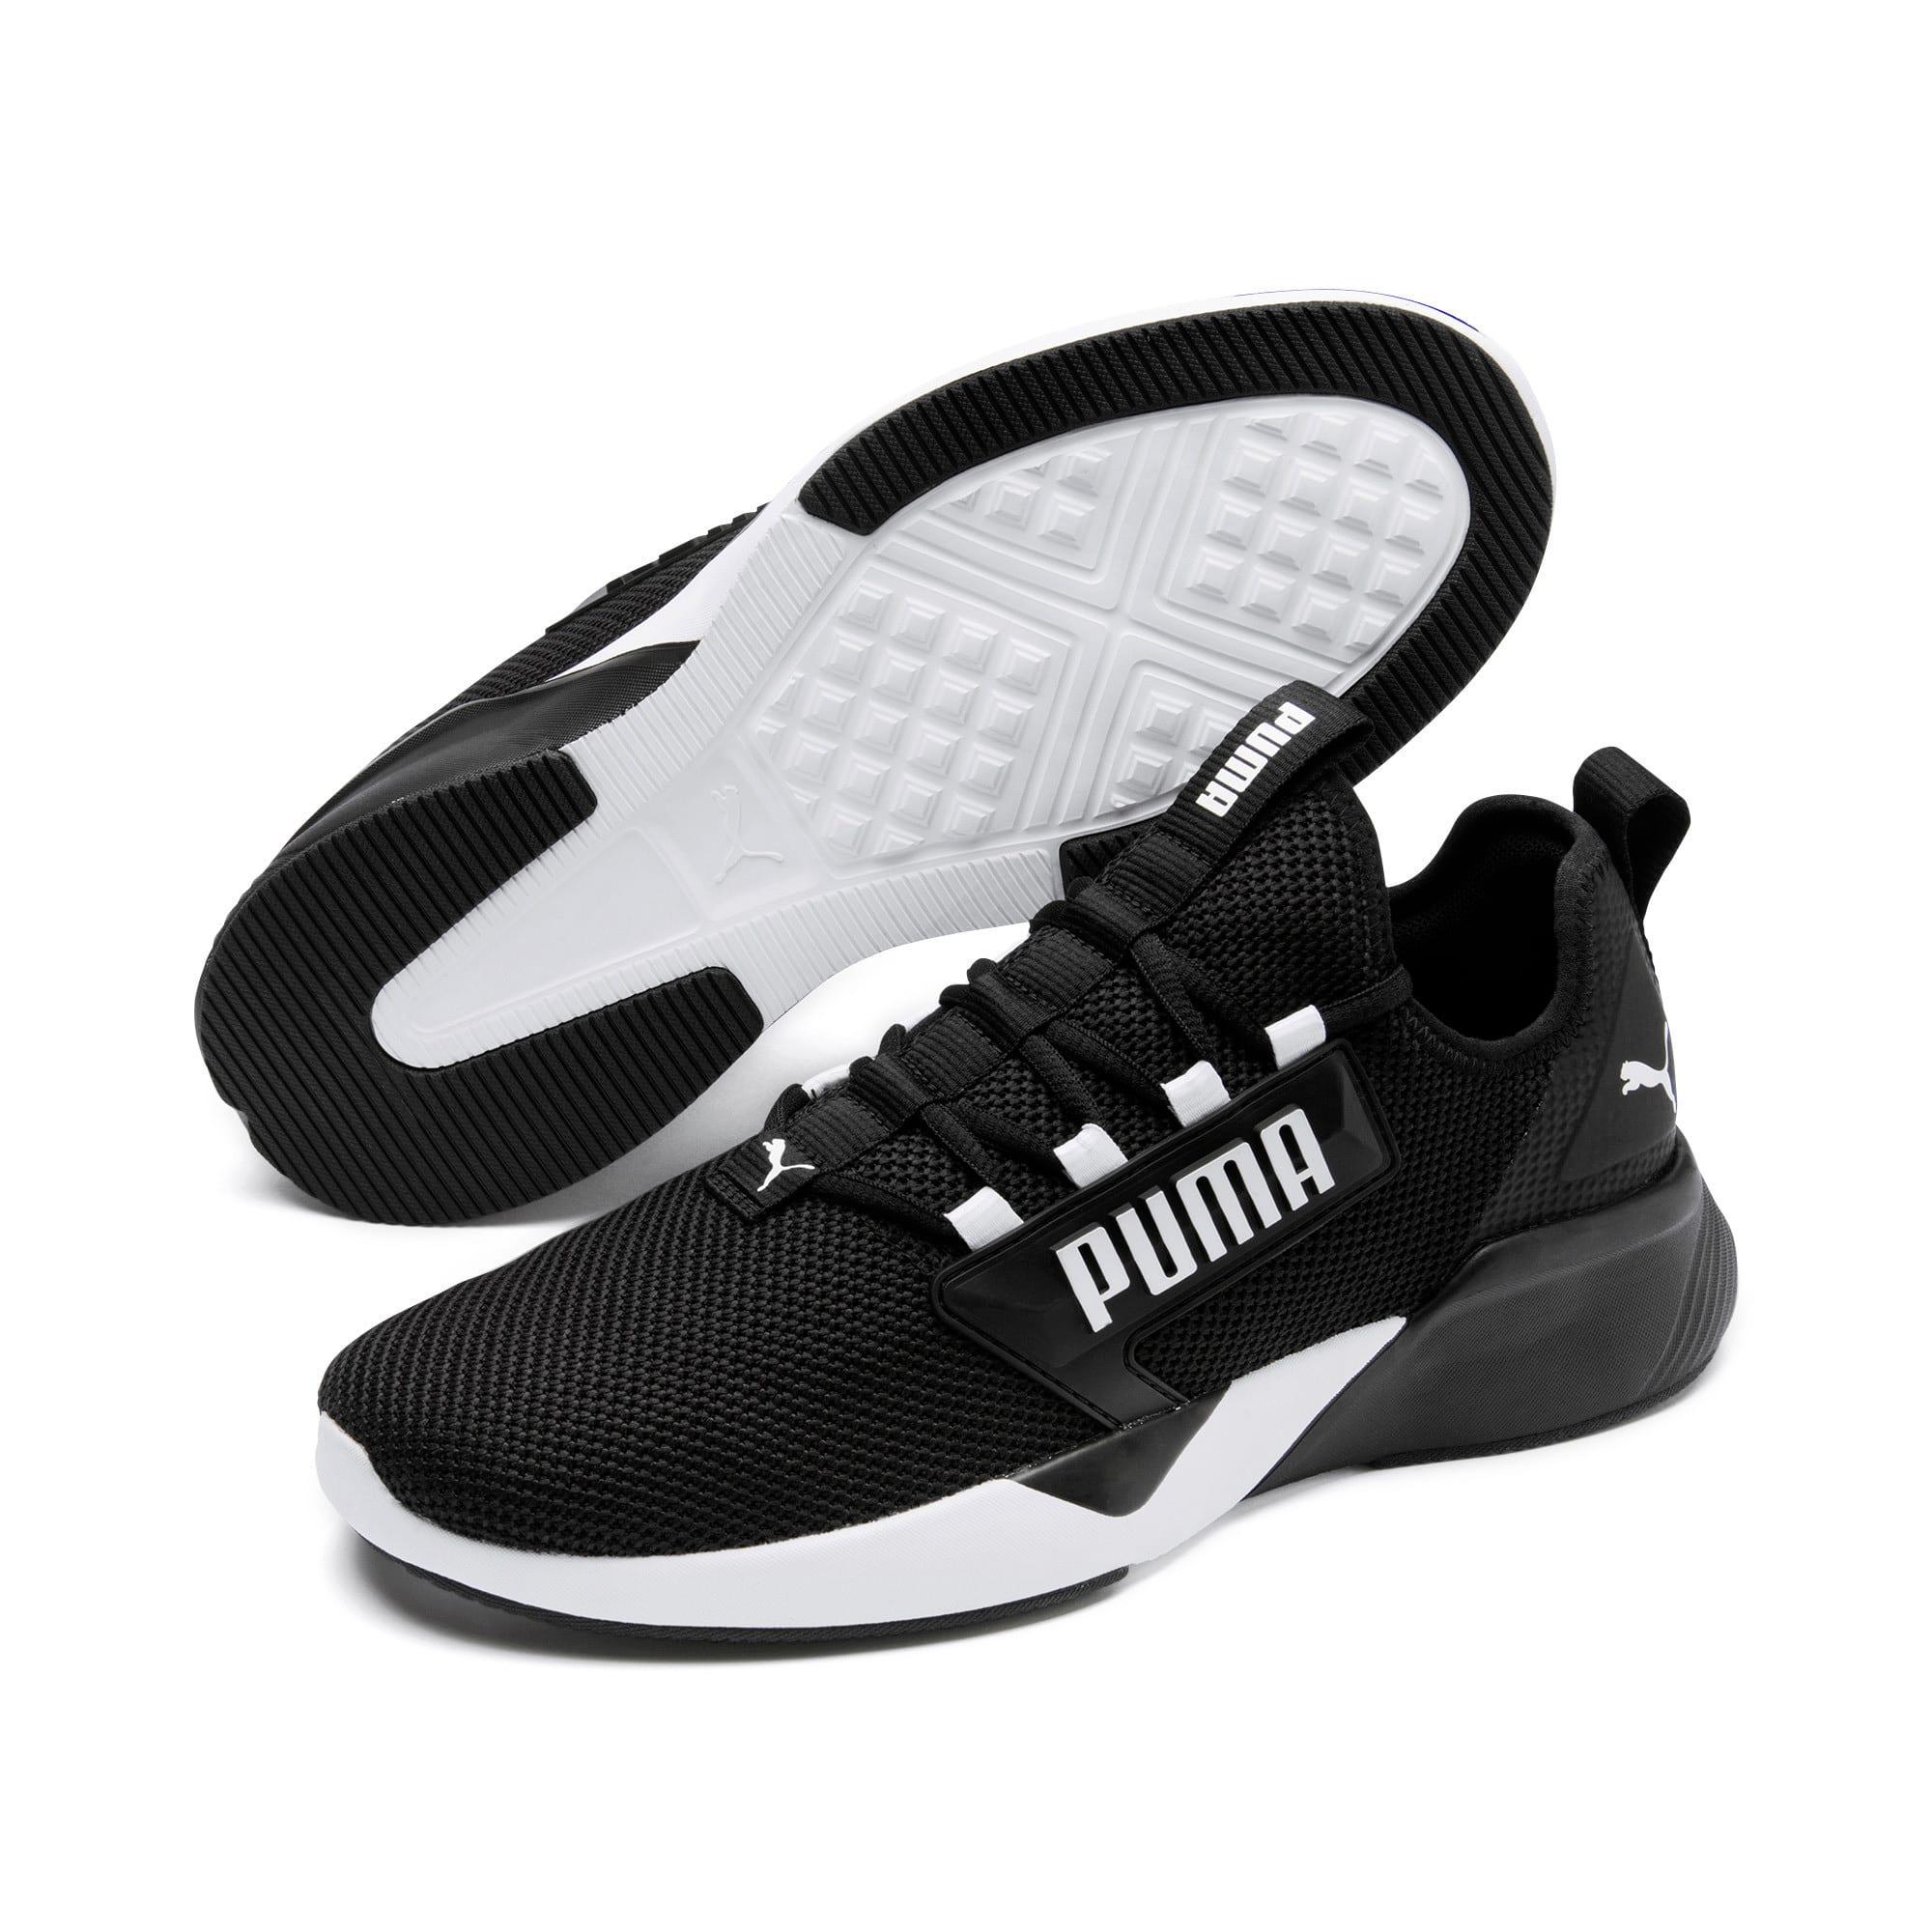 Thumbnail 2 of Retaliate Men's Training Shoes, Puma Black-Puma White, medium